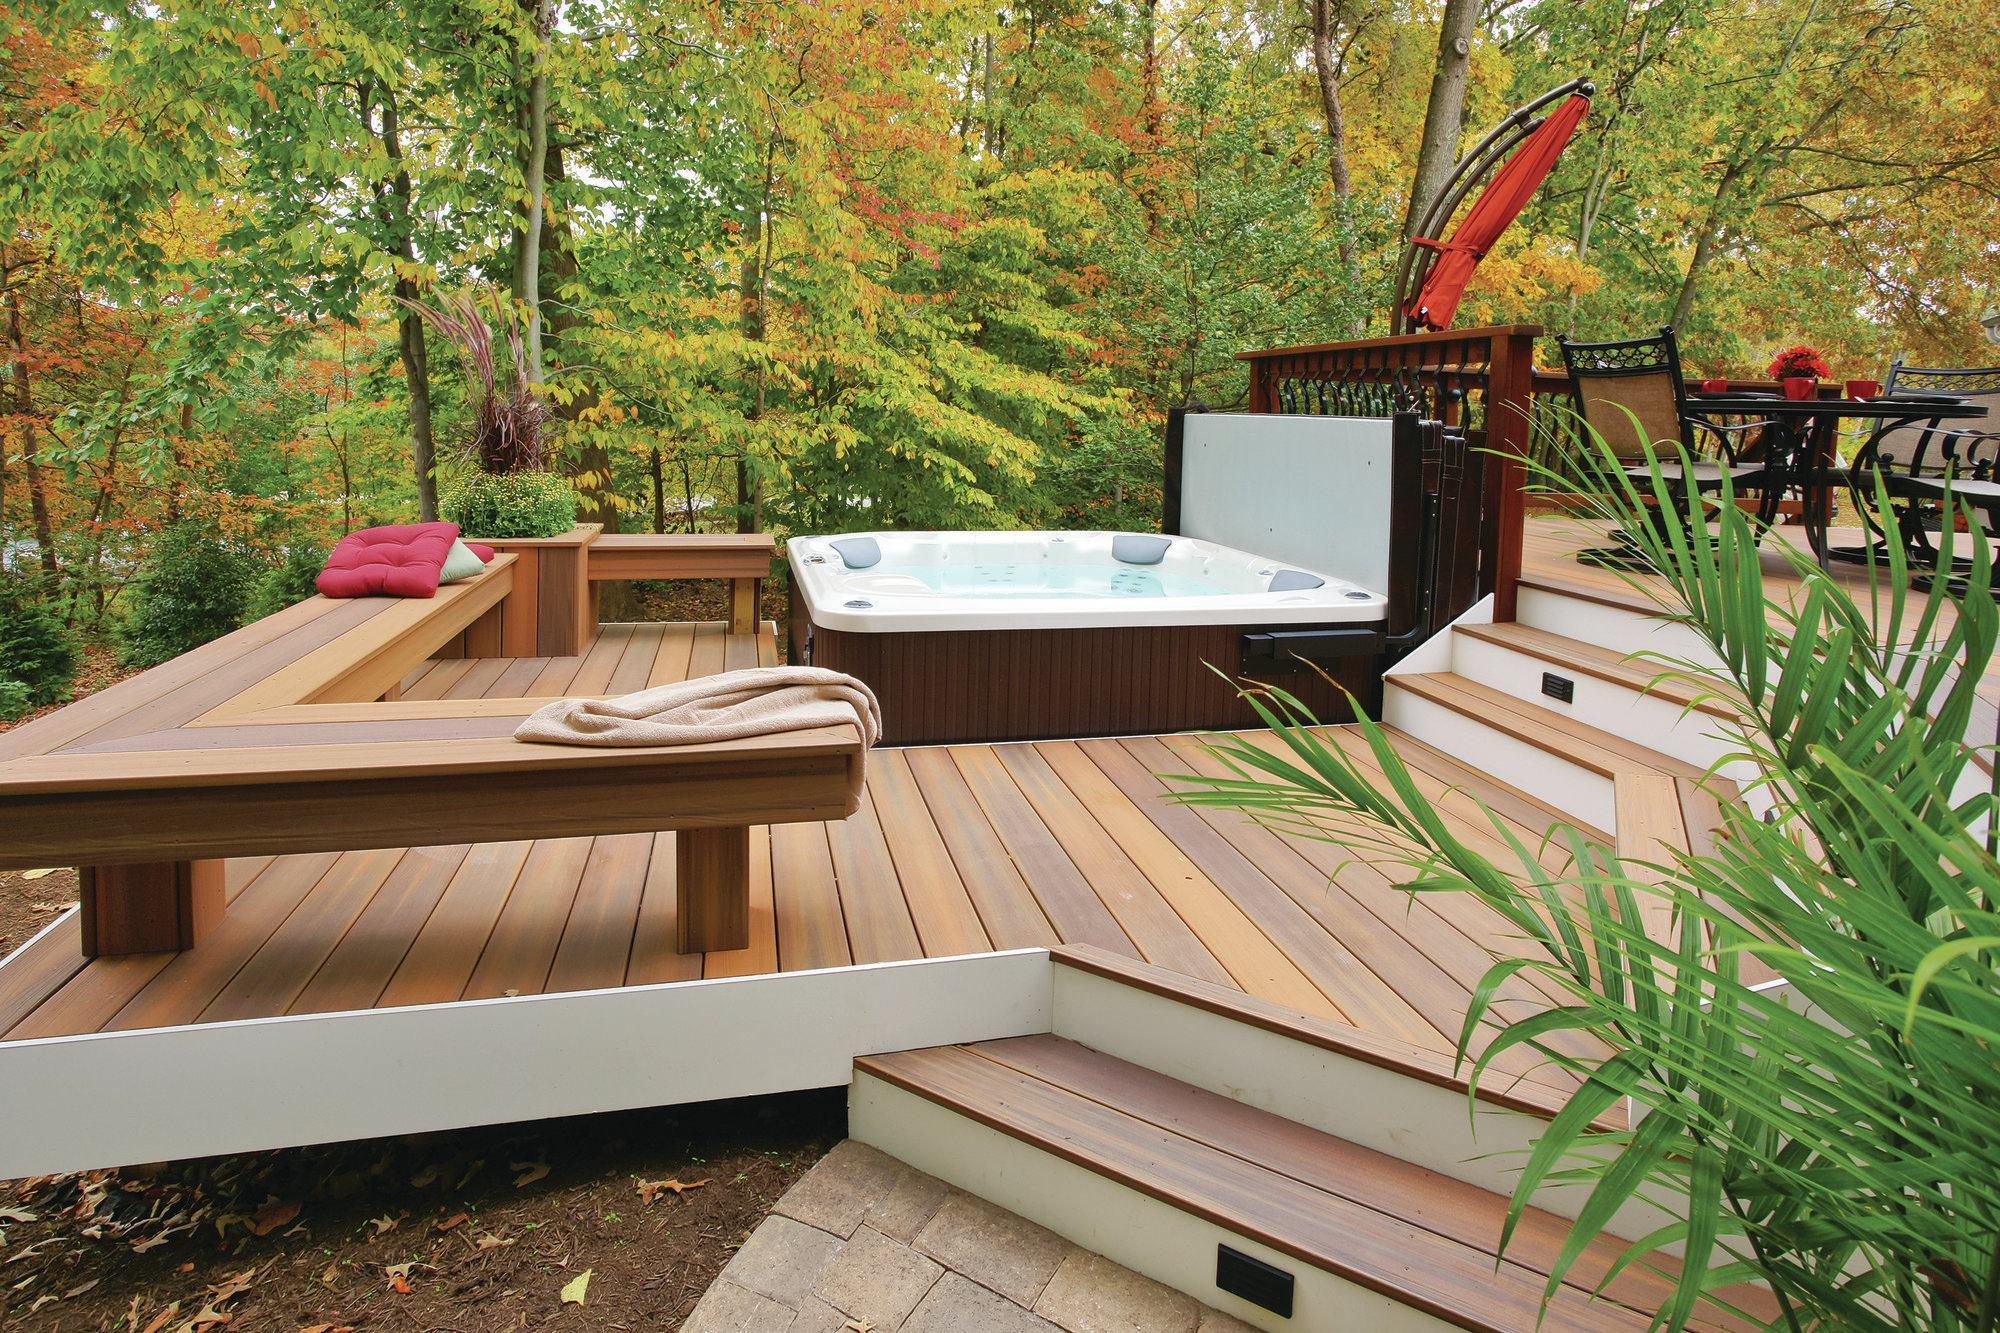 Fullsize Of Hot Tub Deck